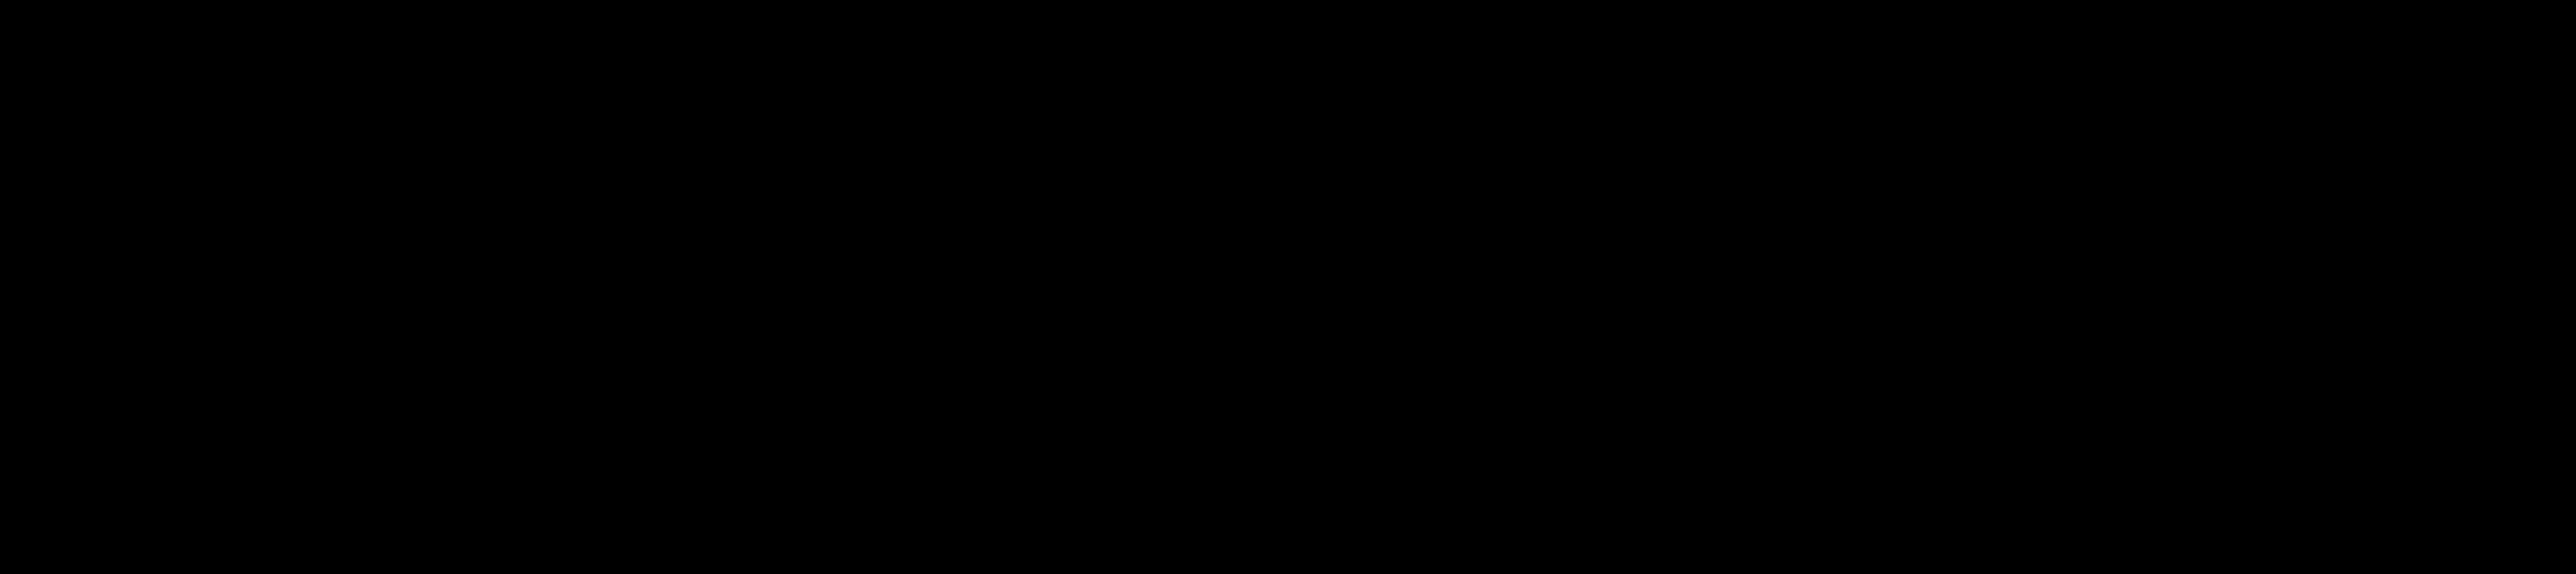 echoes_logo_vr_black